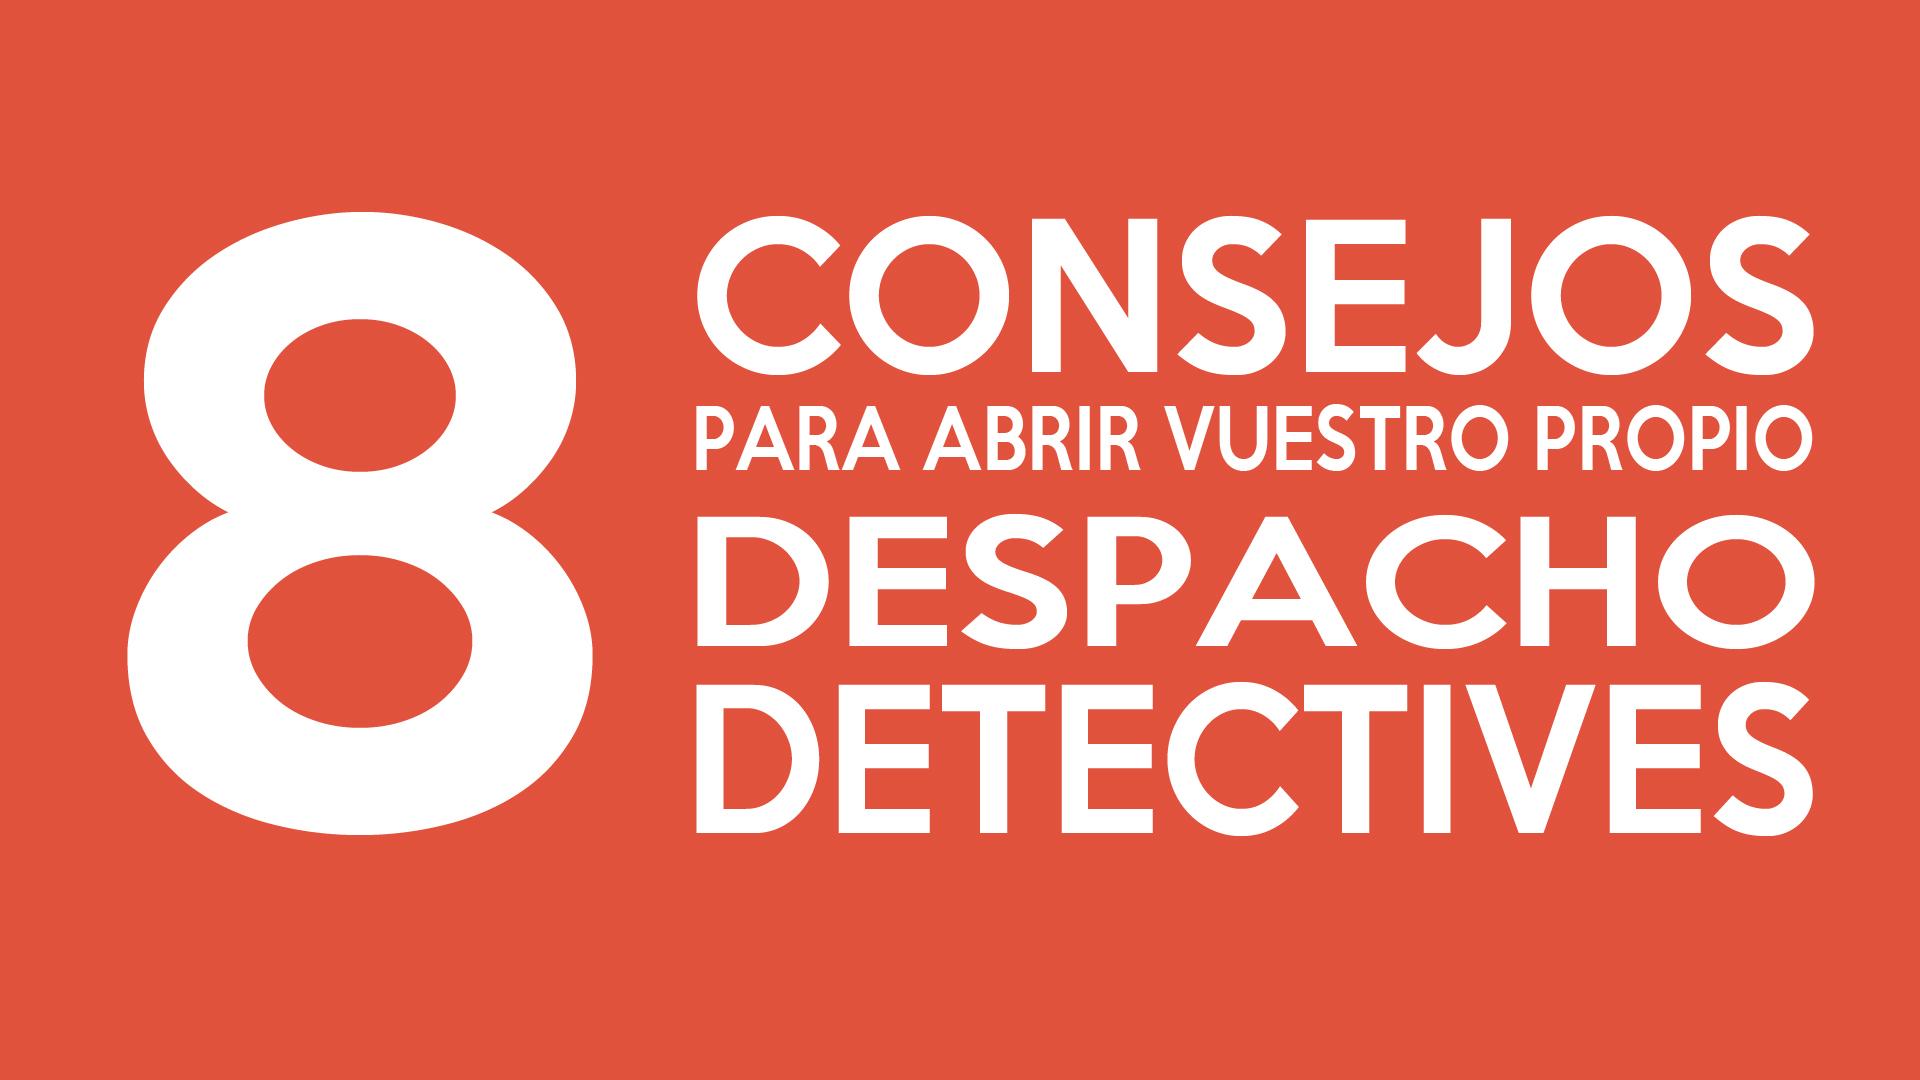 Consejos para abrir un despacho de detectives